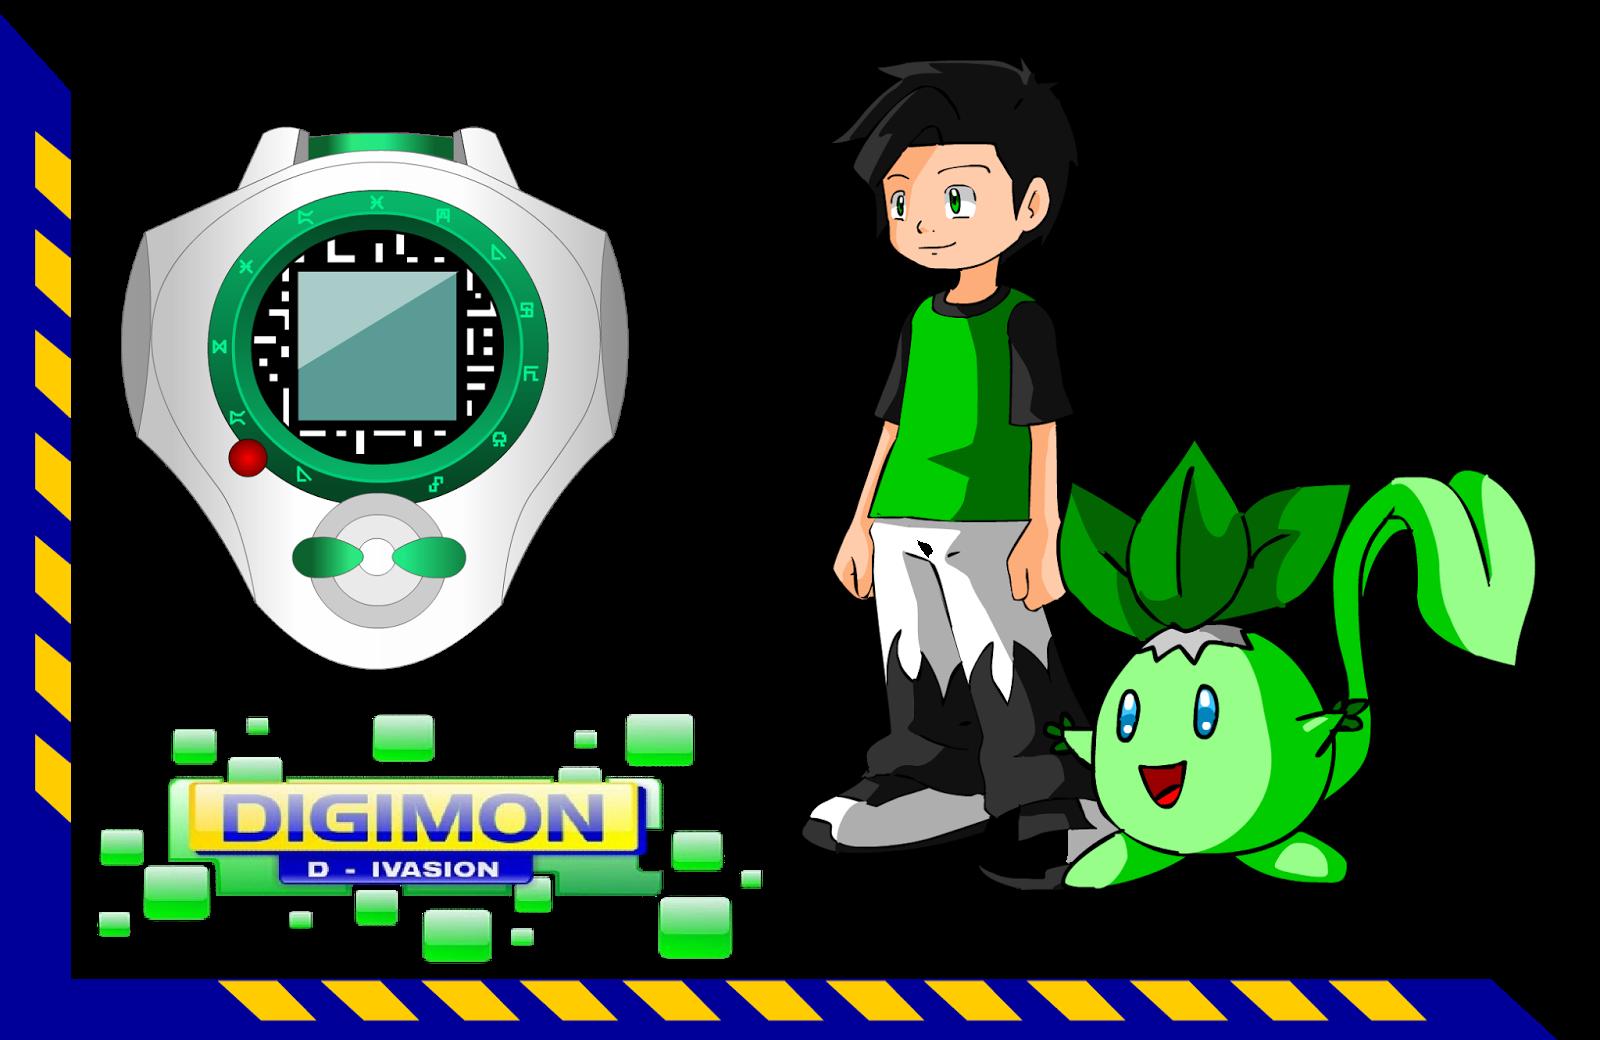 Digimon D-invasion novas imagens e preview do episódio 4 RAFA